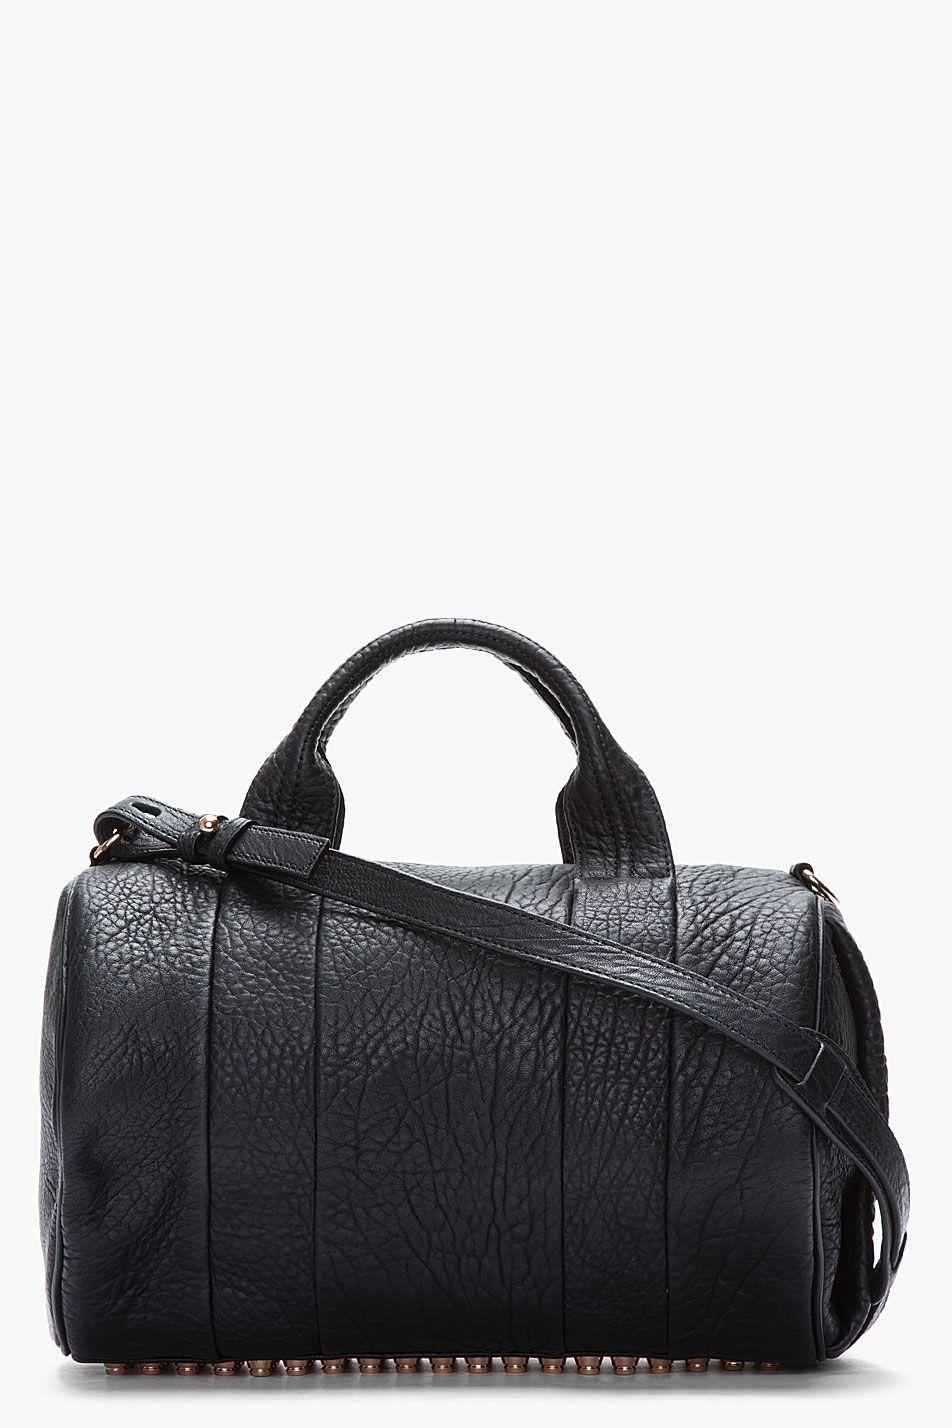 Womens black leather duffle bag